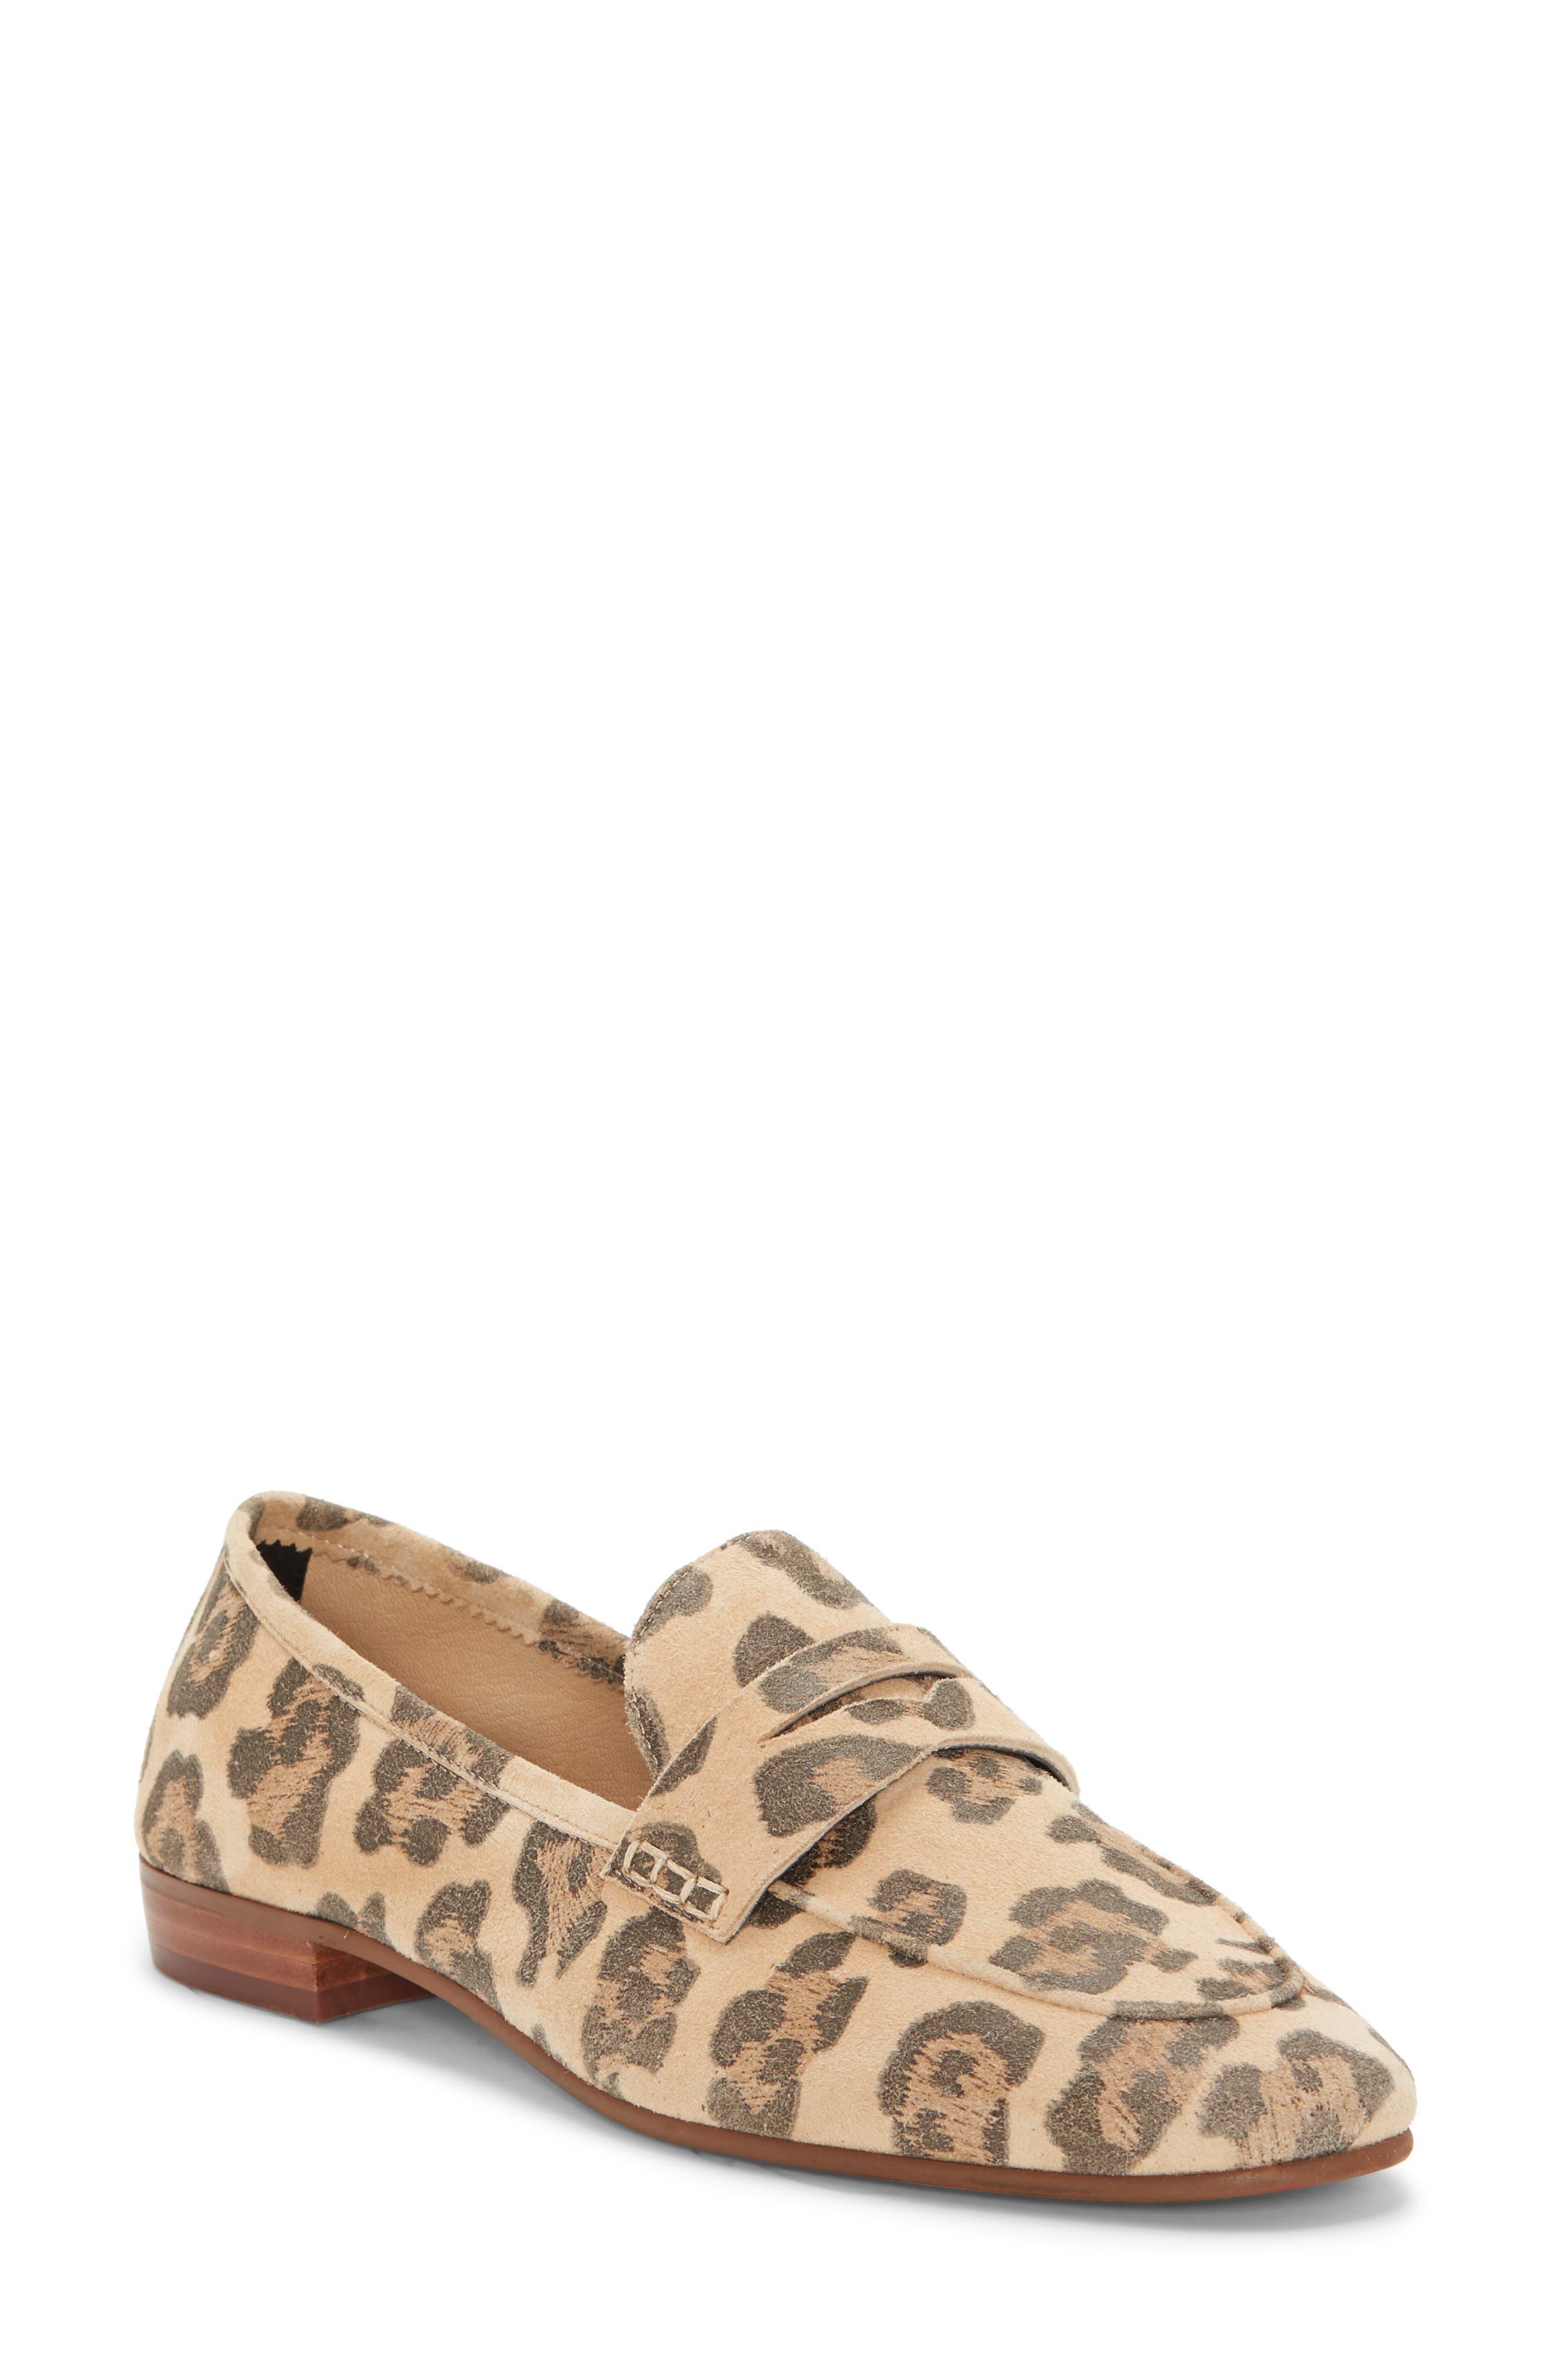 Women'S Macinda Metallic Leather Loafers in Natural Leopard Haircalf